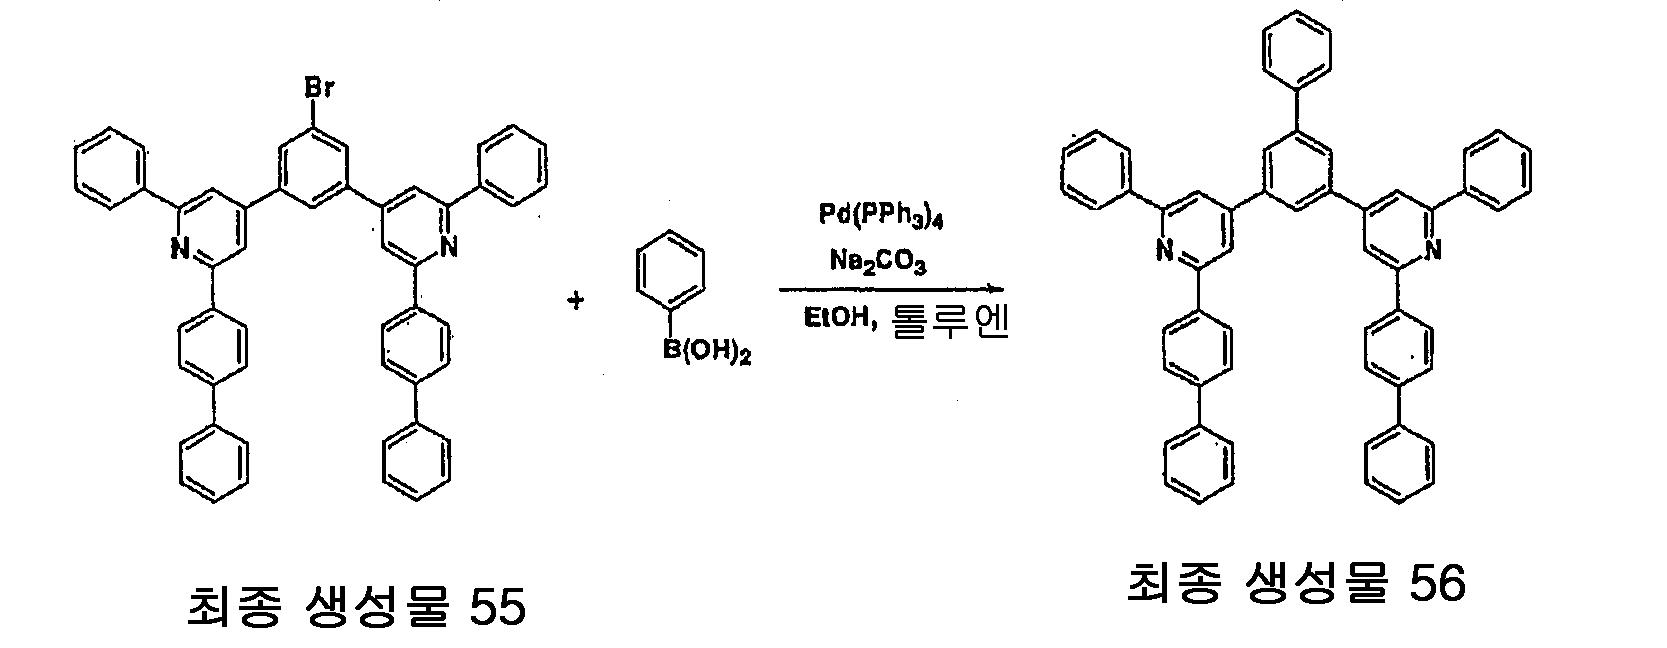 Figure 112010002231902-pat00144